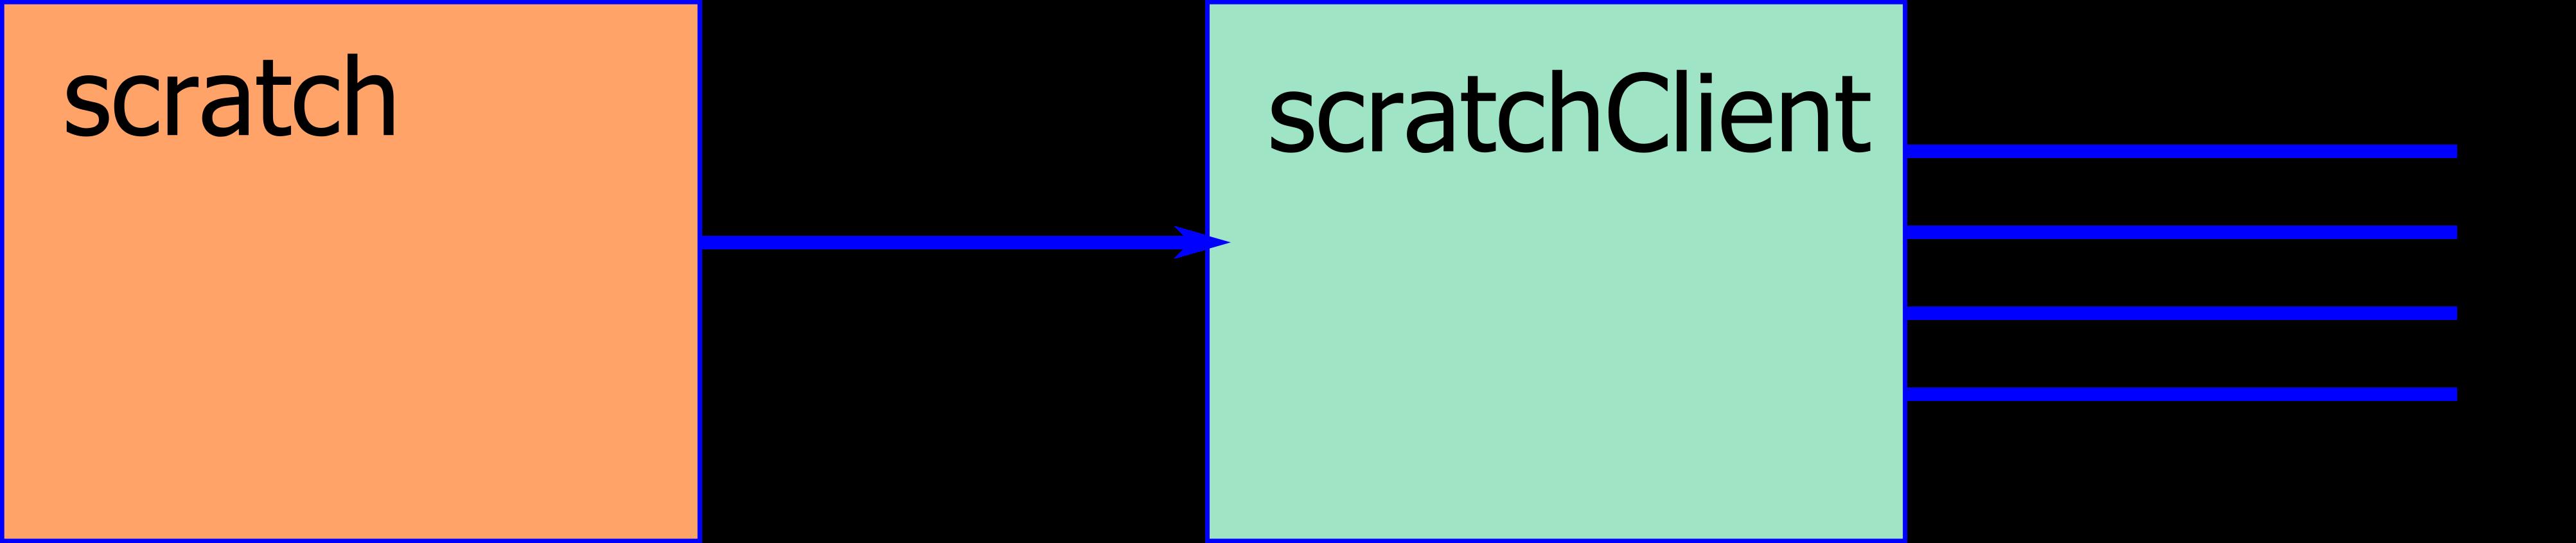 scratch_broadcast_scratchClient